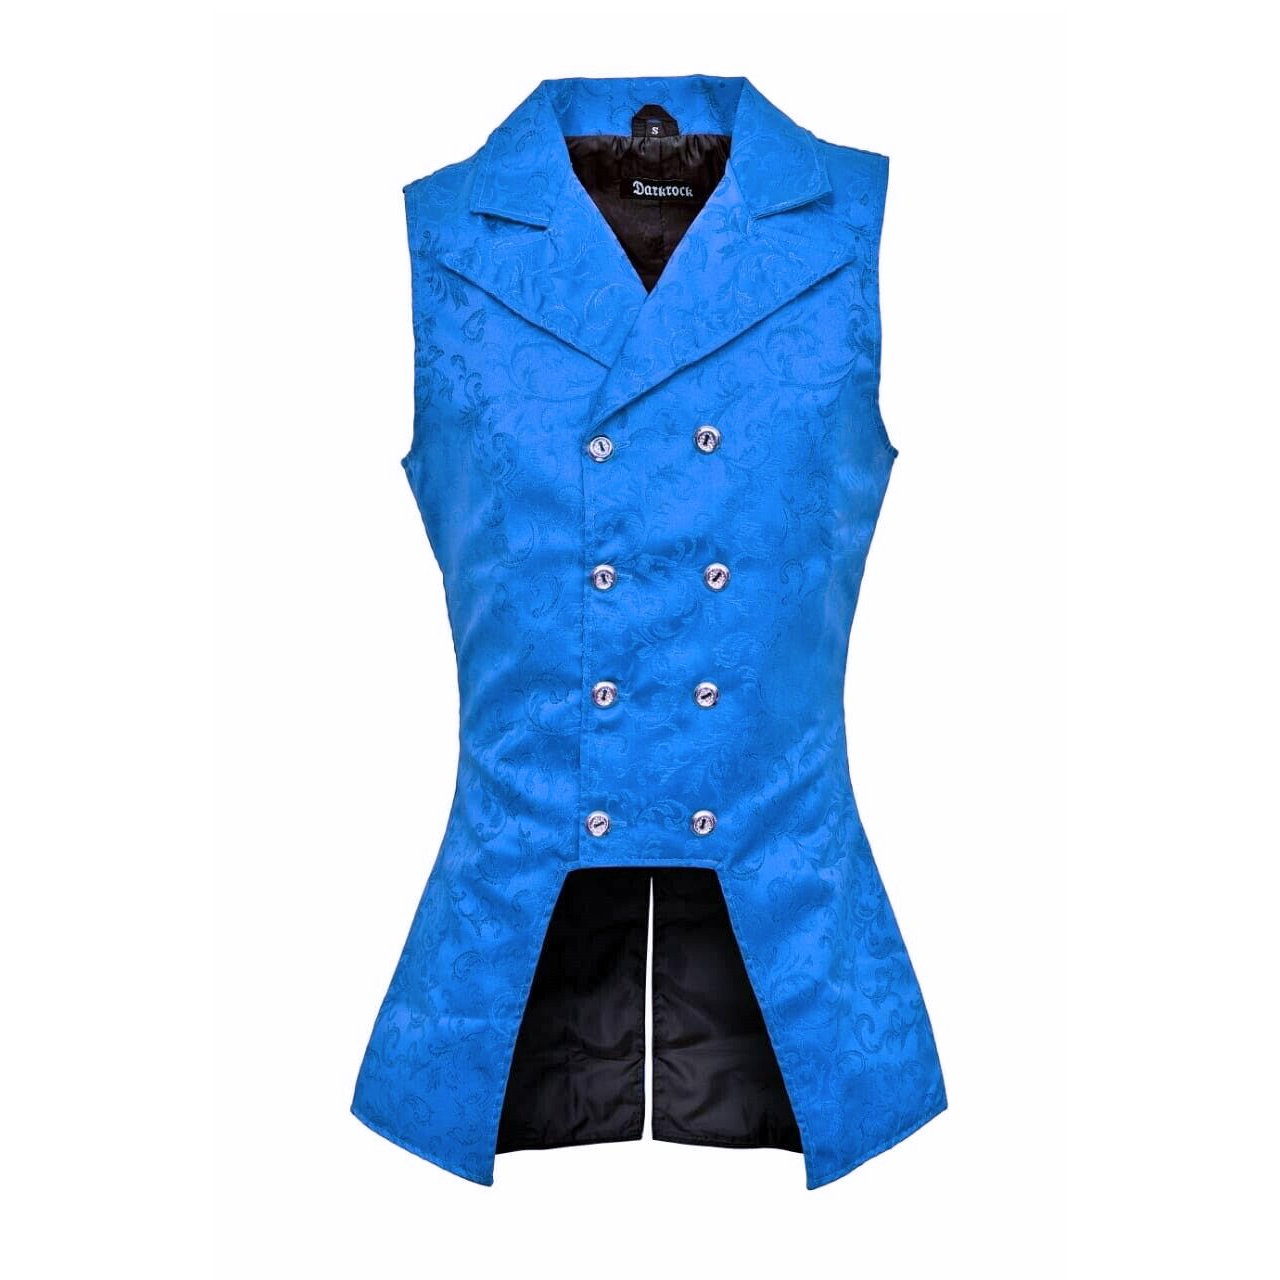 DARKROCK Royal Blue Double Breasted GOVERNOR Vest Waistcoat (front).jpg